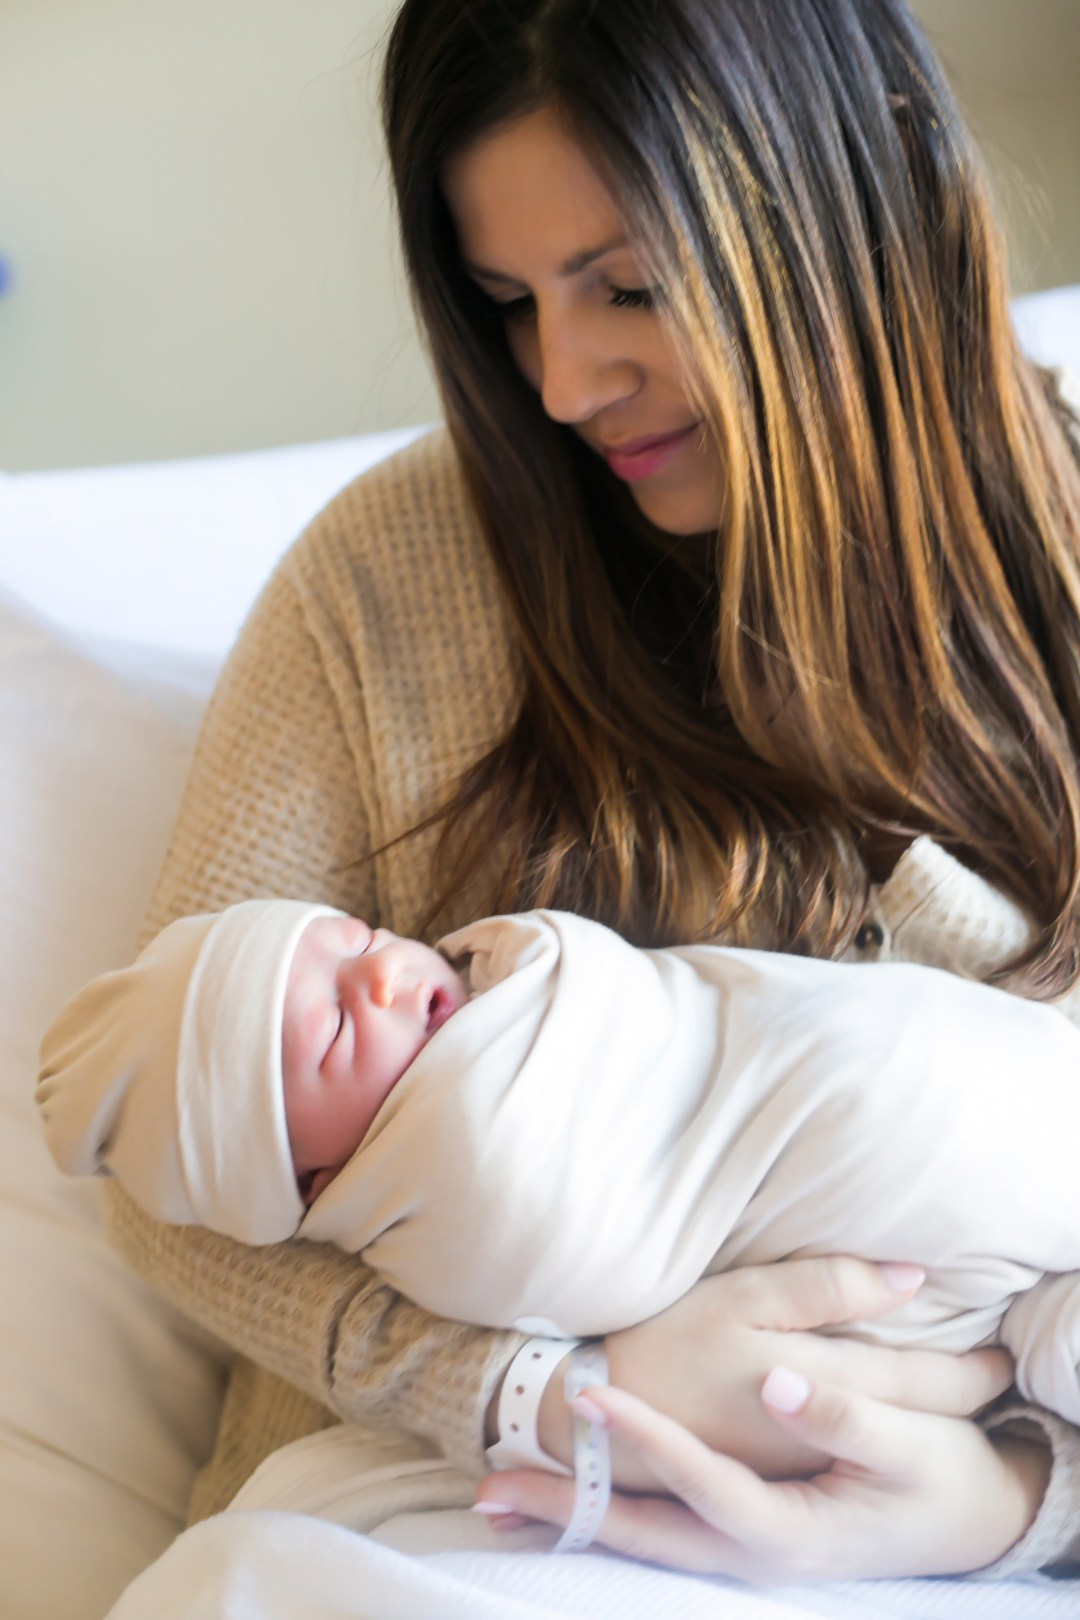 mom and baby photography, Jaime Cittadino fashion and lifestyle blogger